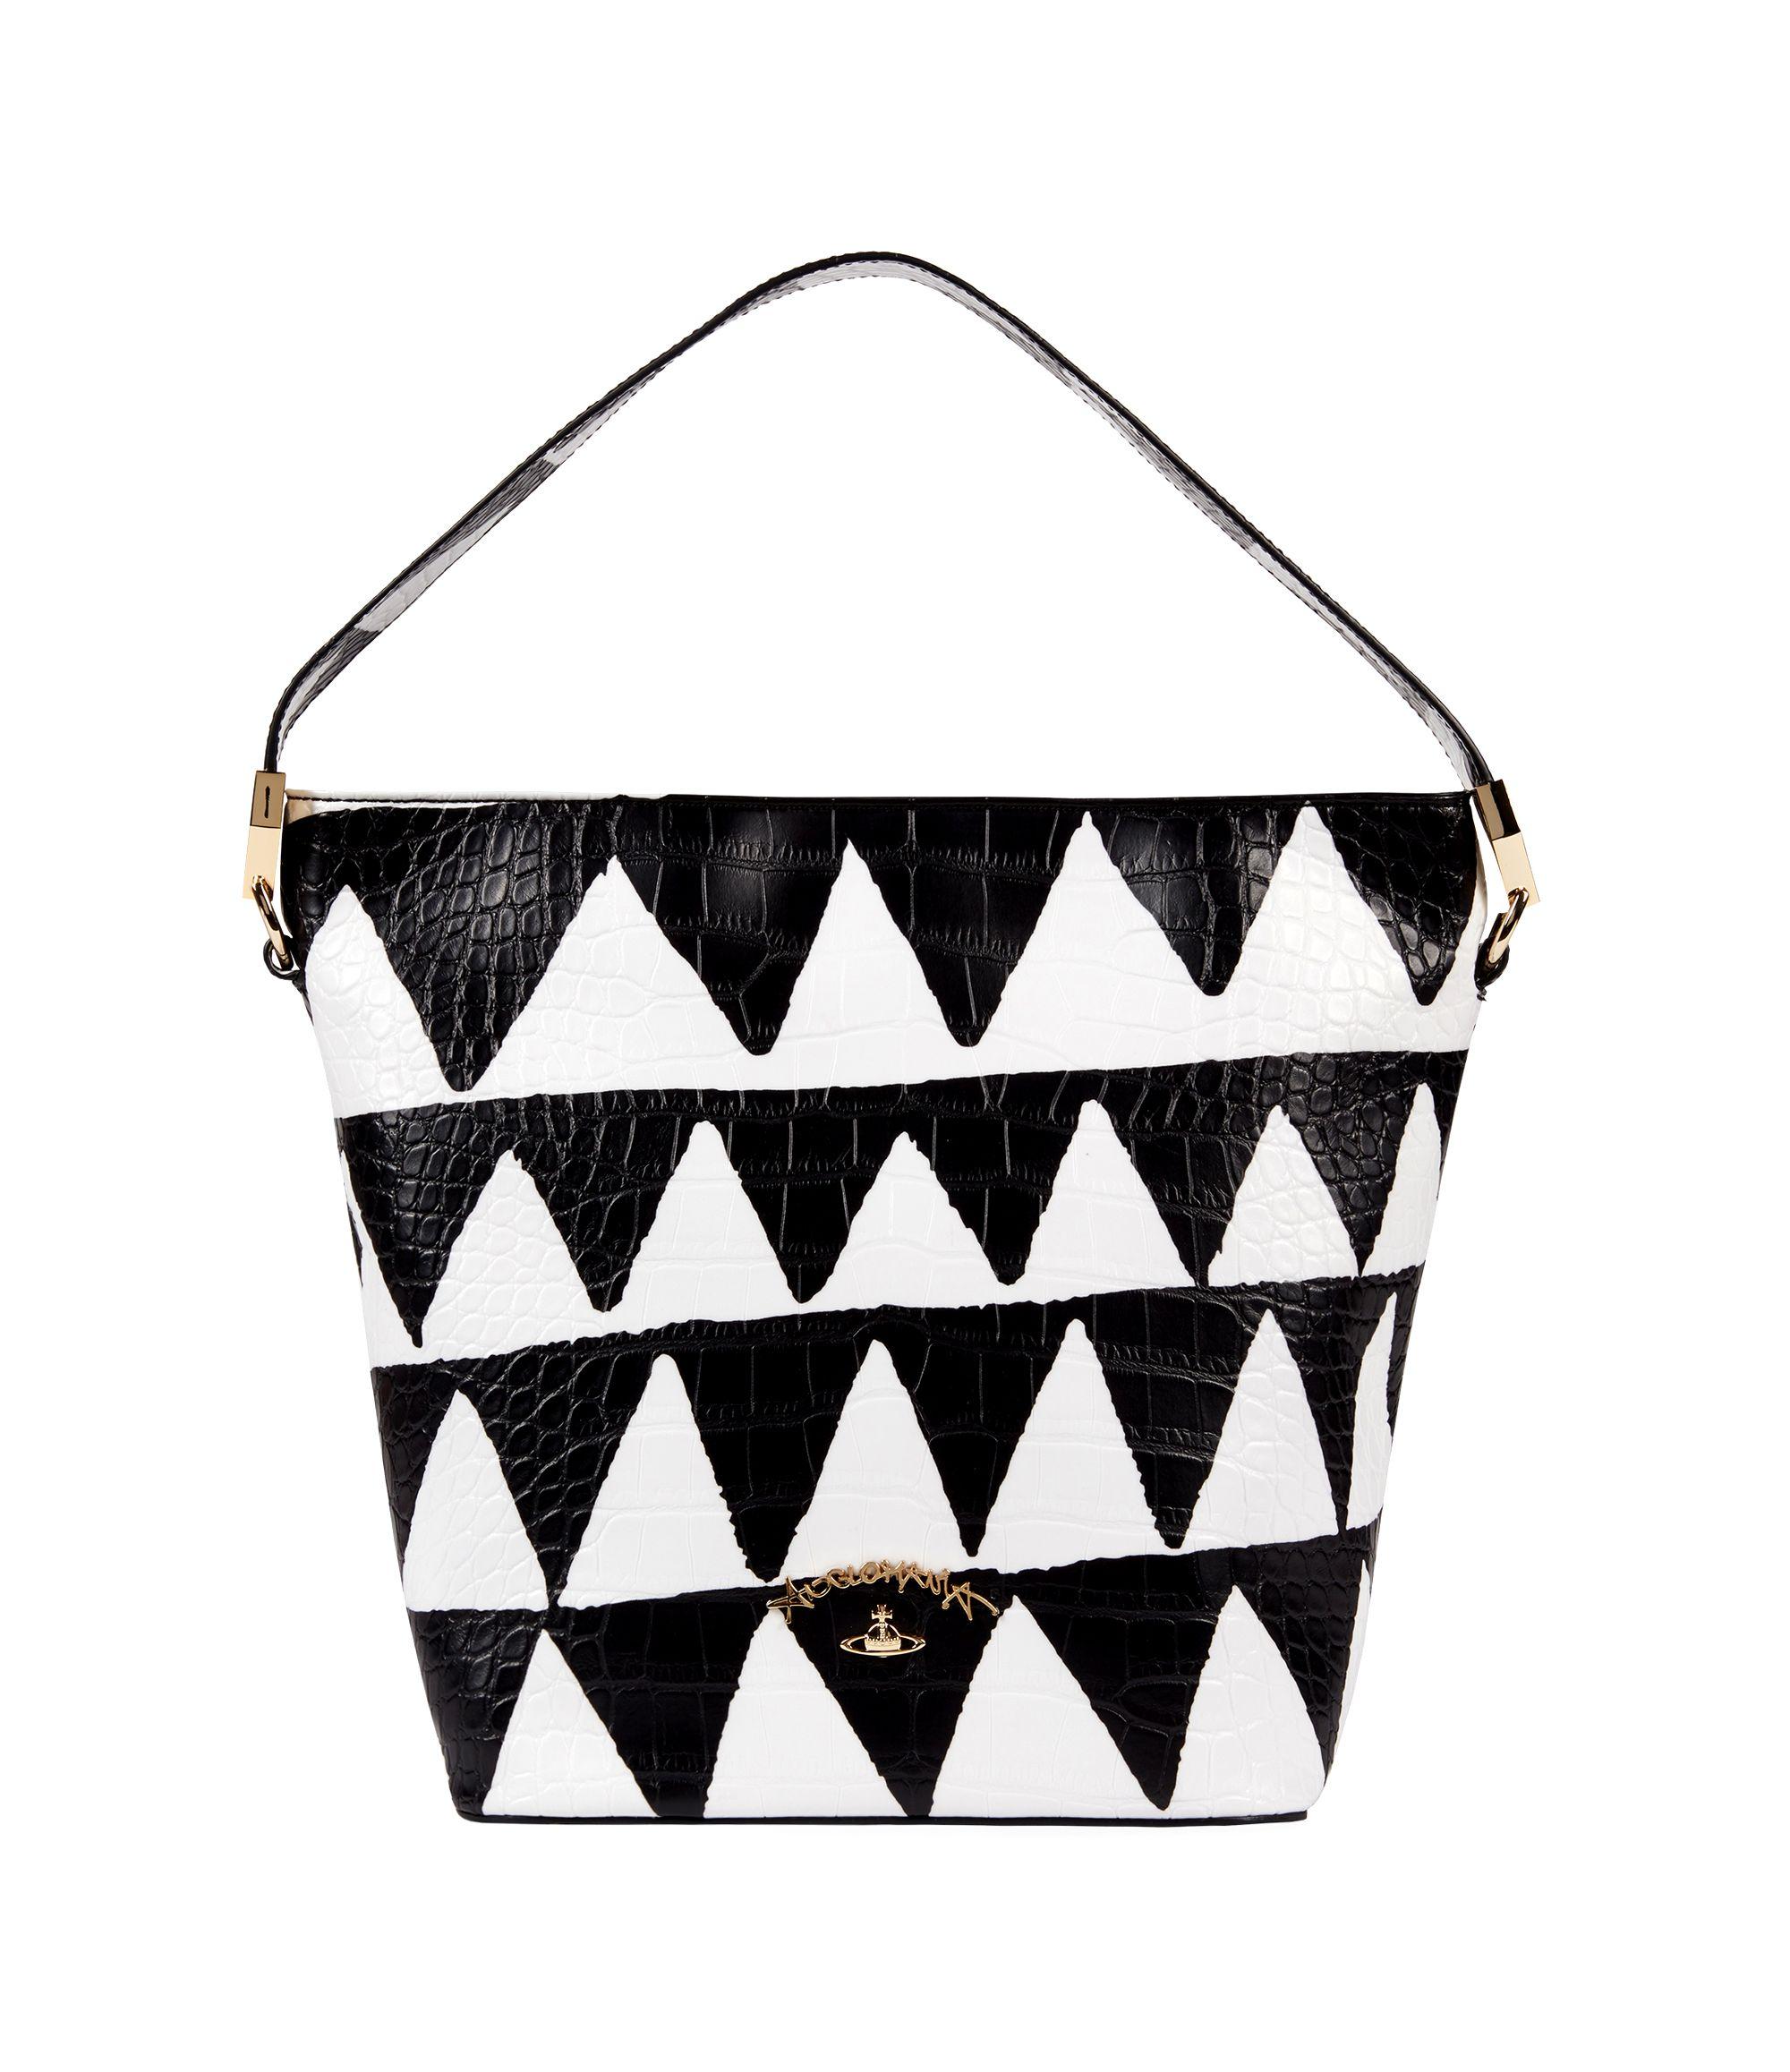 2dbd656613d VIVIENNE WESTWOOD Bristol Bag 7347 White Triangle. #viviennewestwood #bags  # #